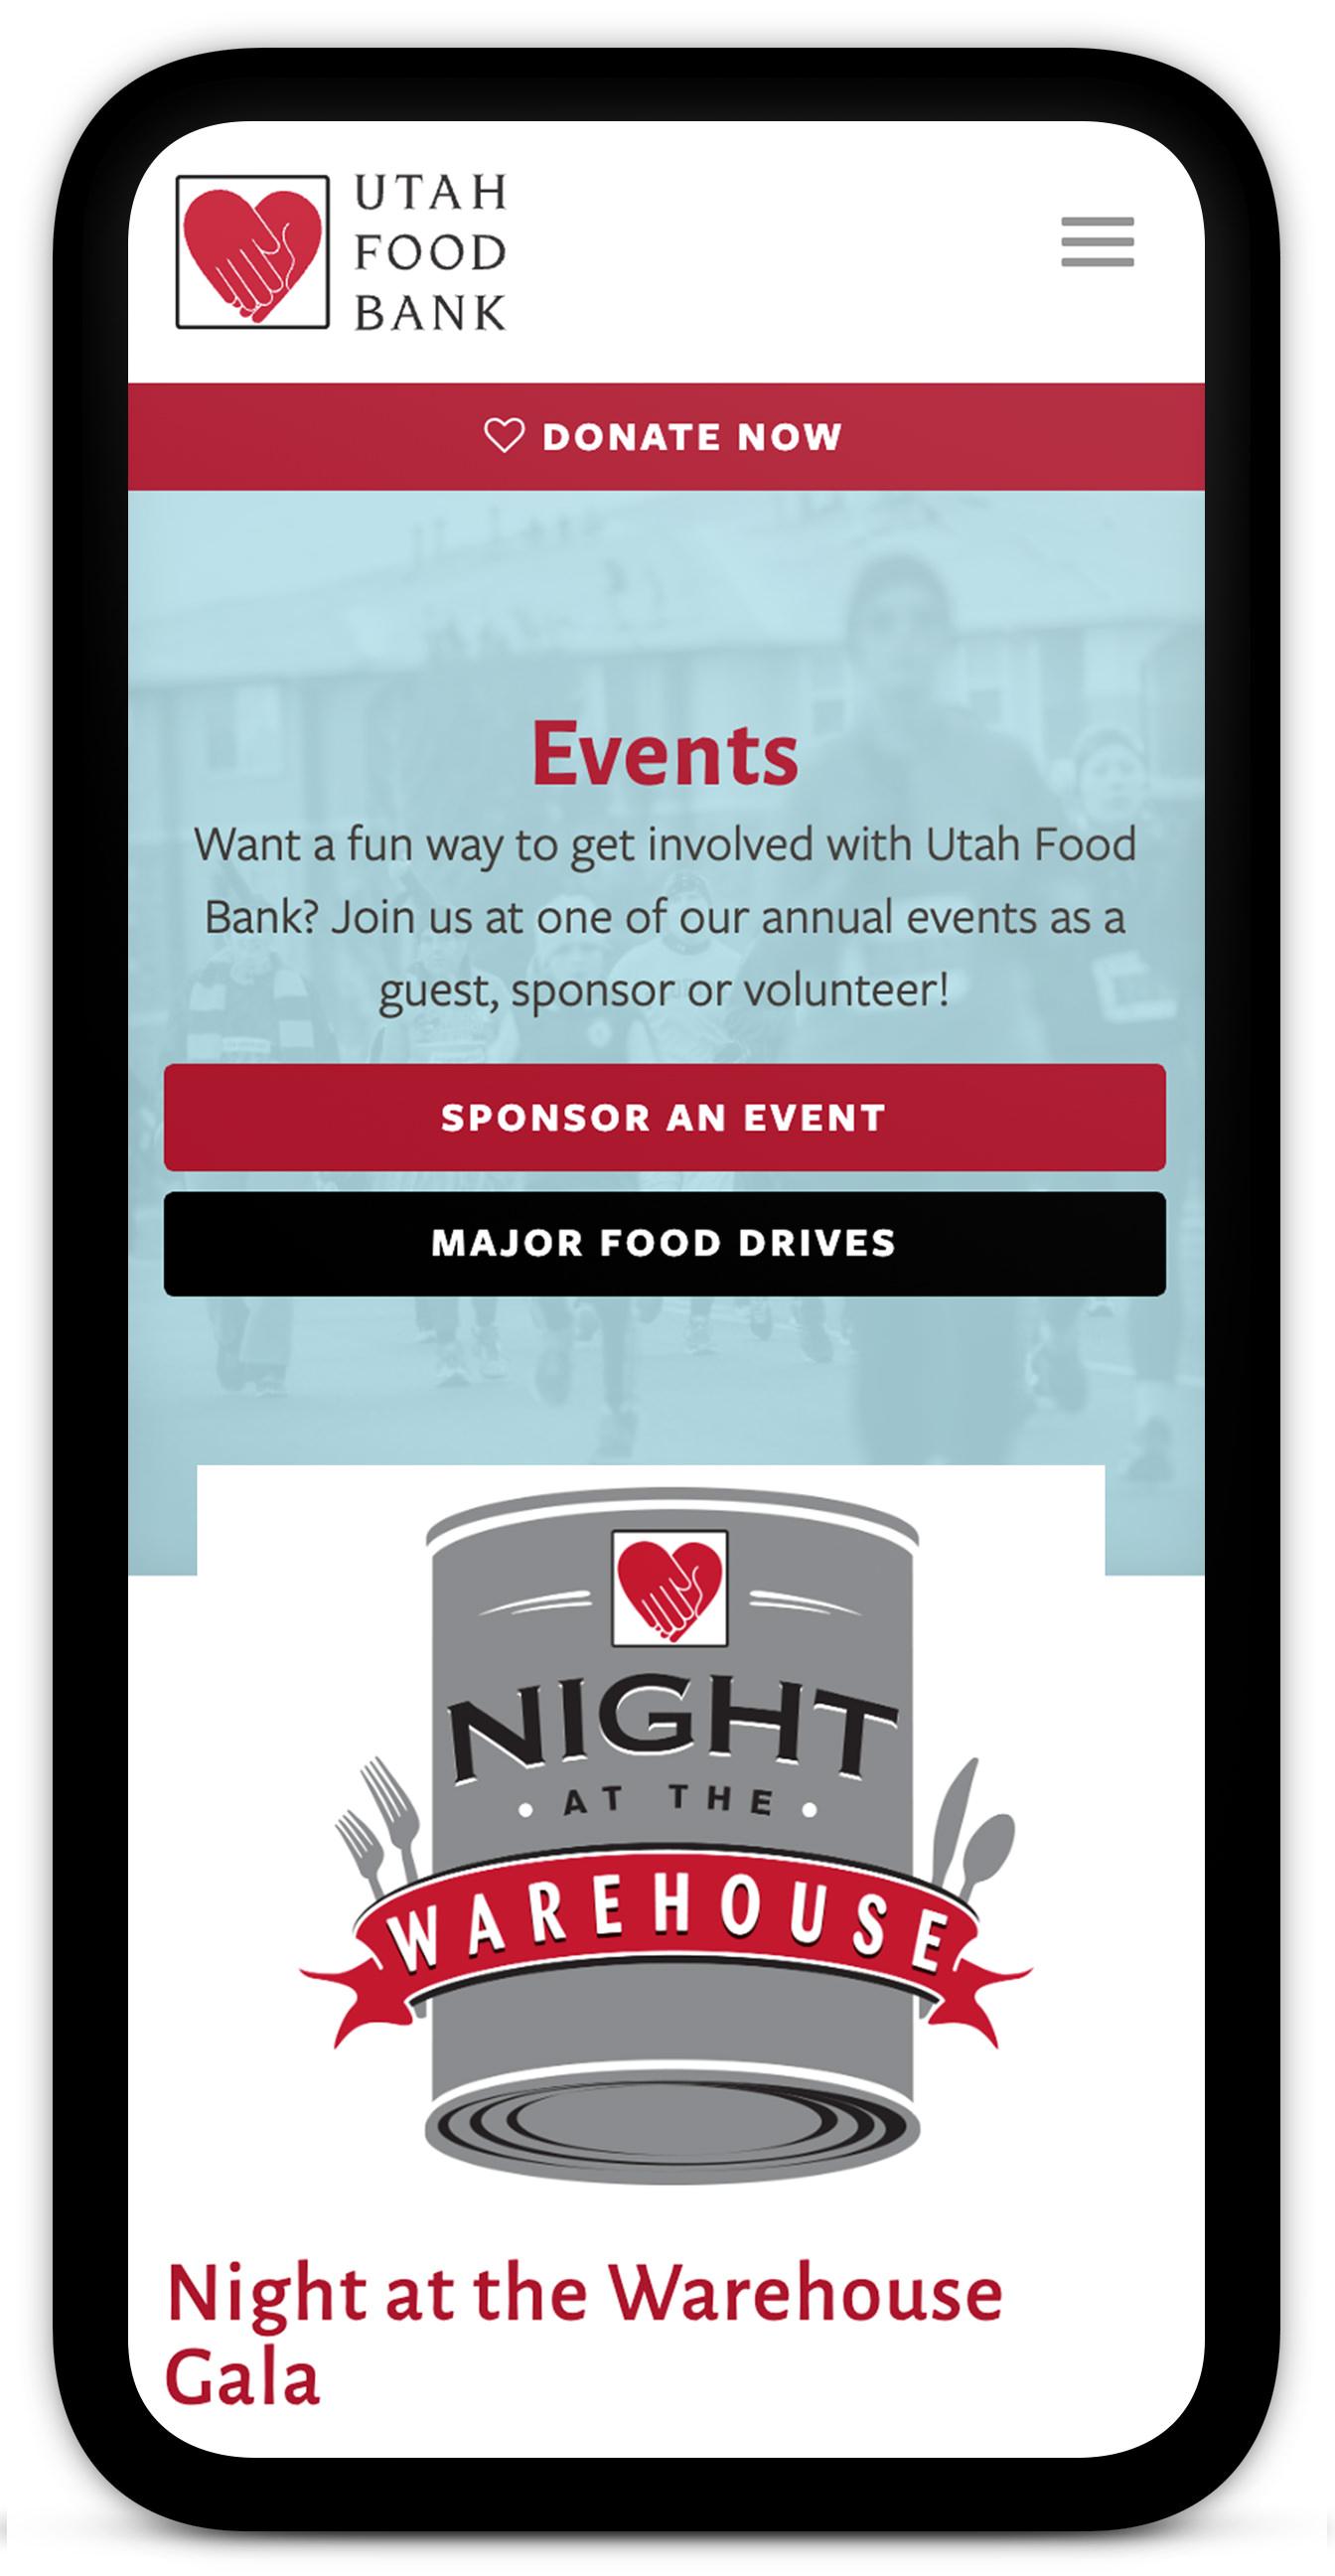 Utah Food Bank-Mobile-Frontal-Mockup-Events.jpg